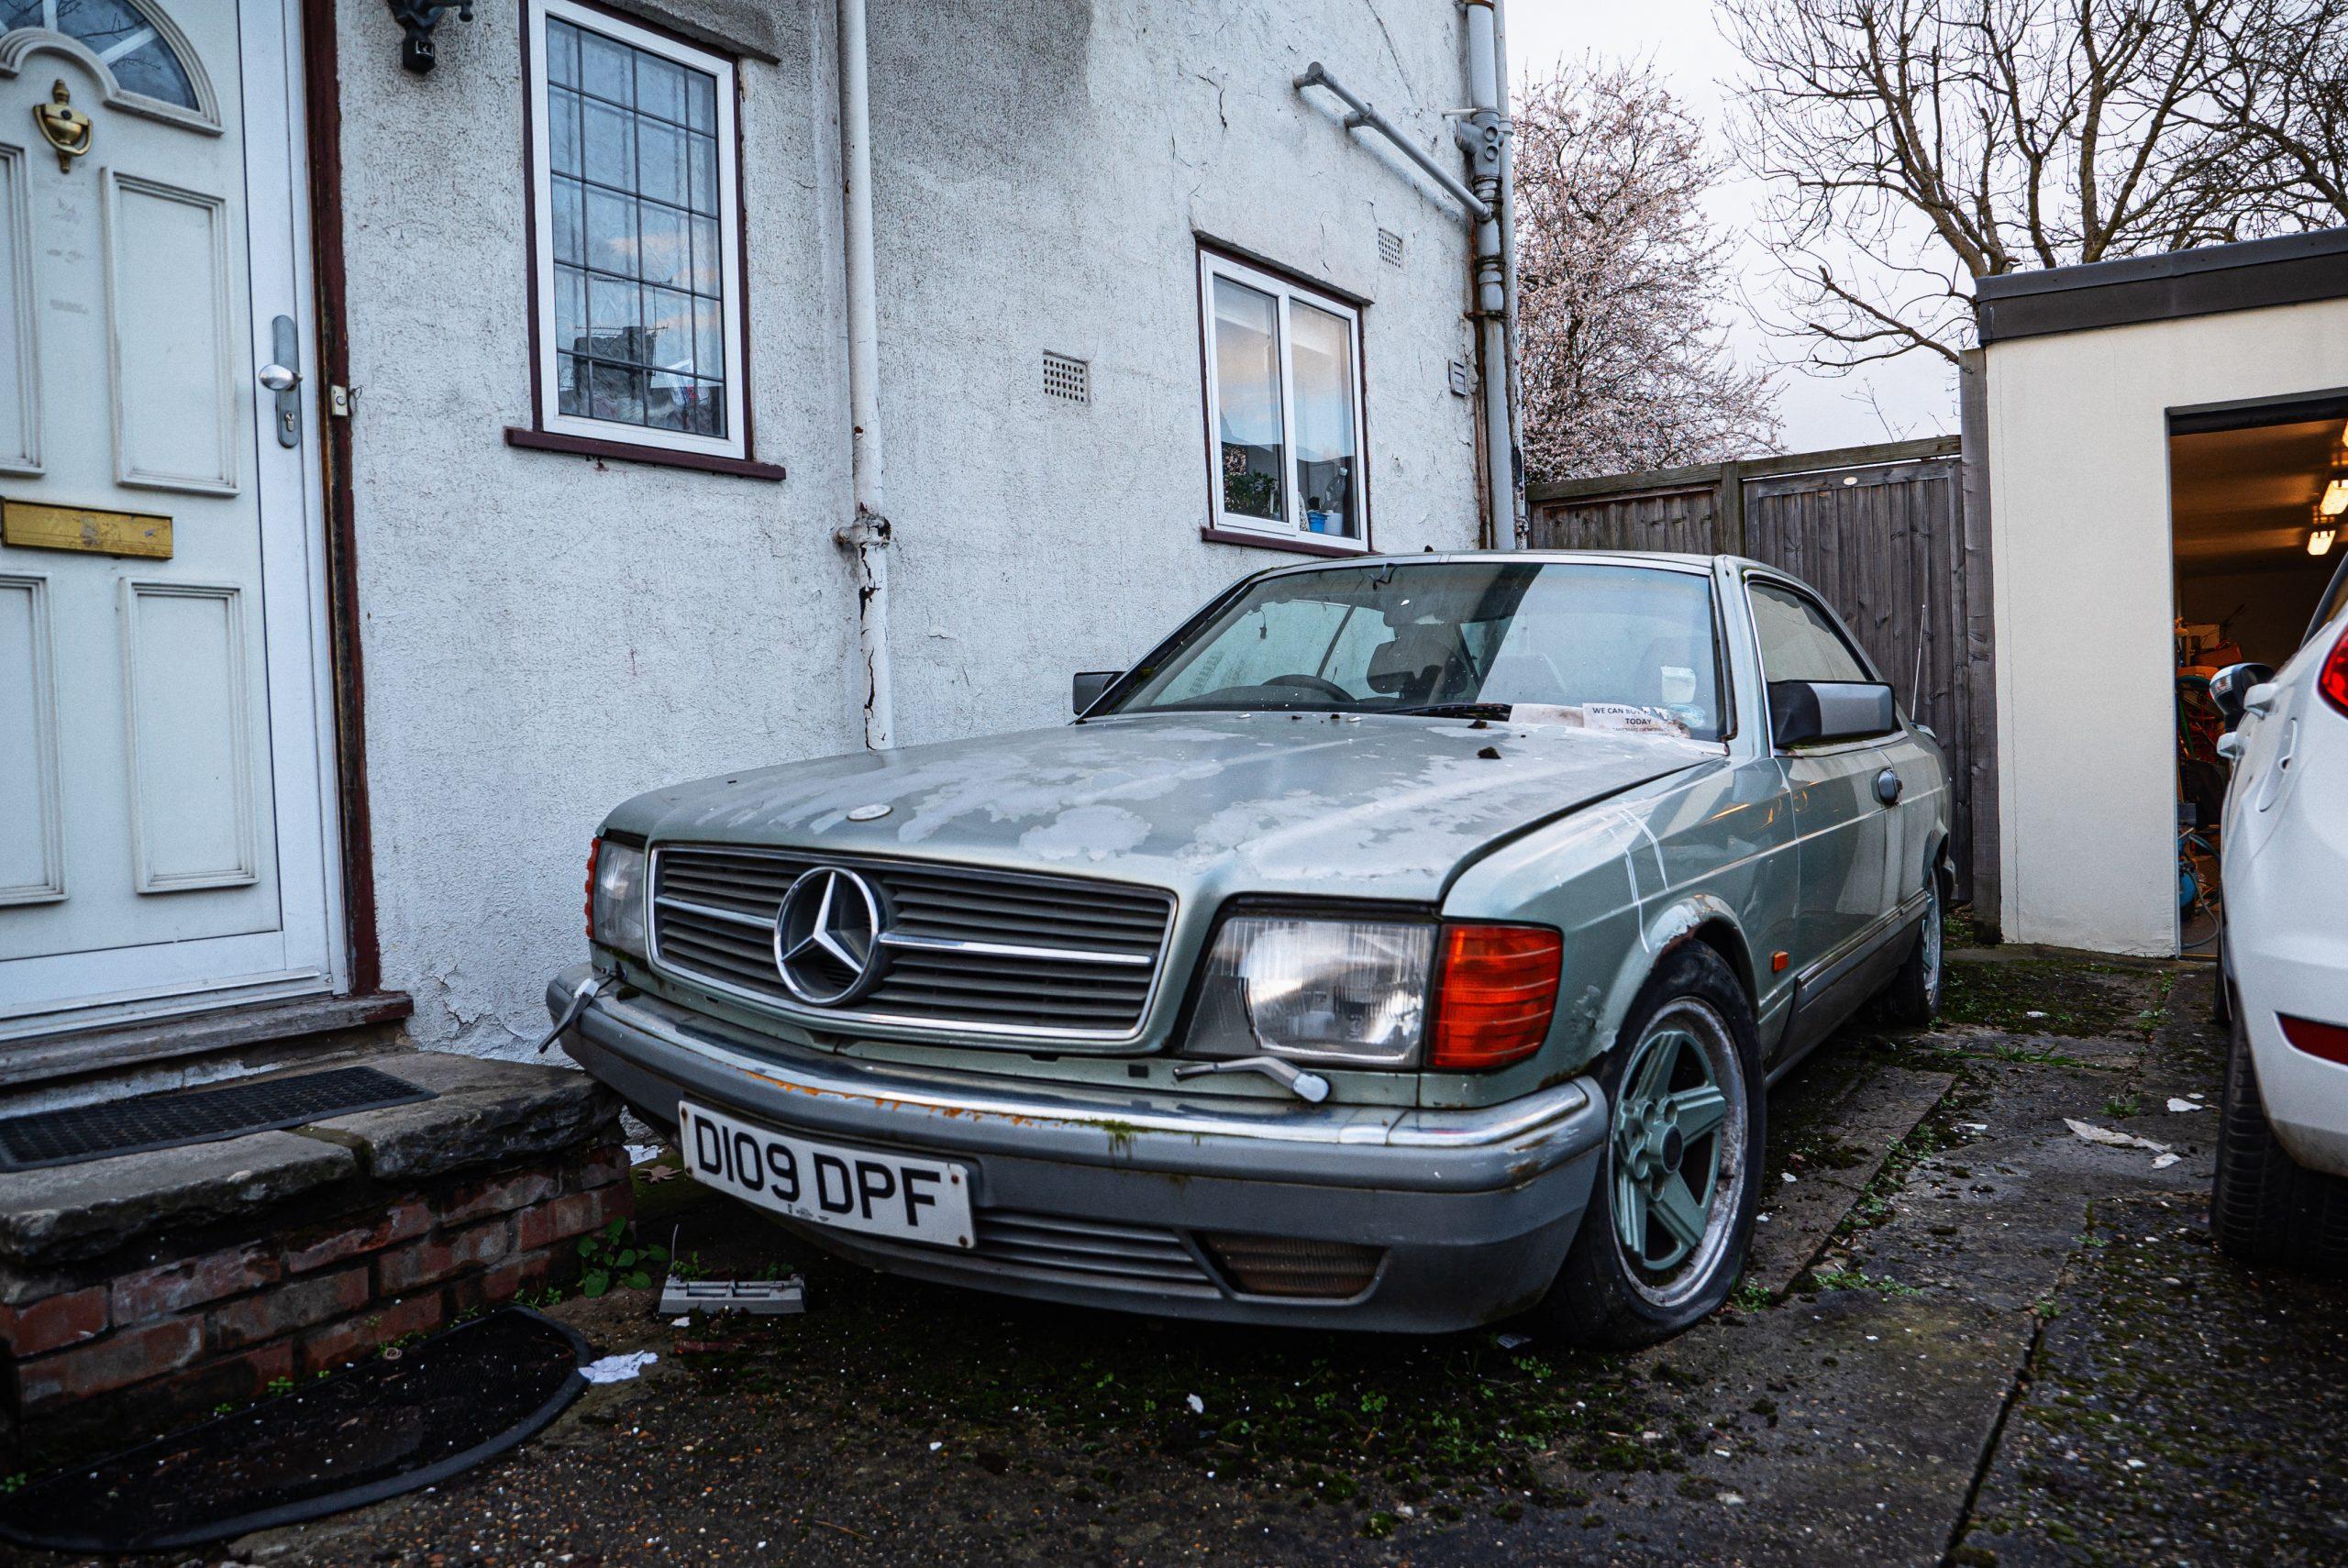 Barn Find Hunter UK - AMG Mercedes-Benz with supercharger